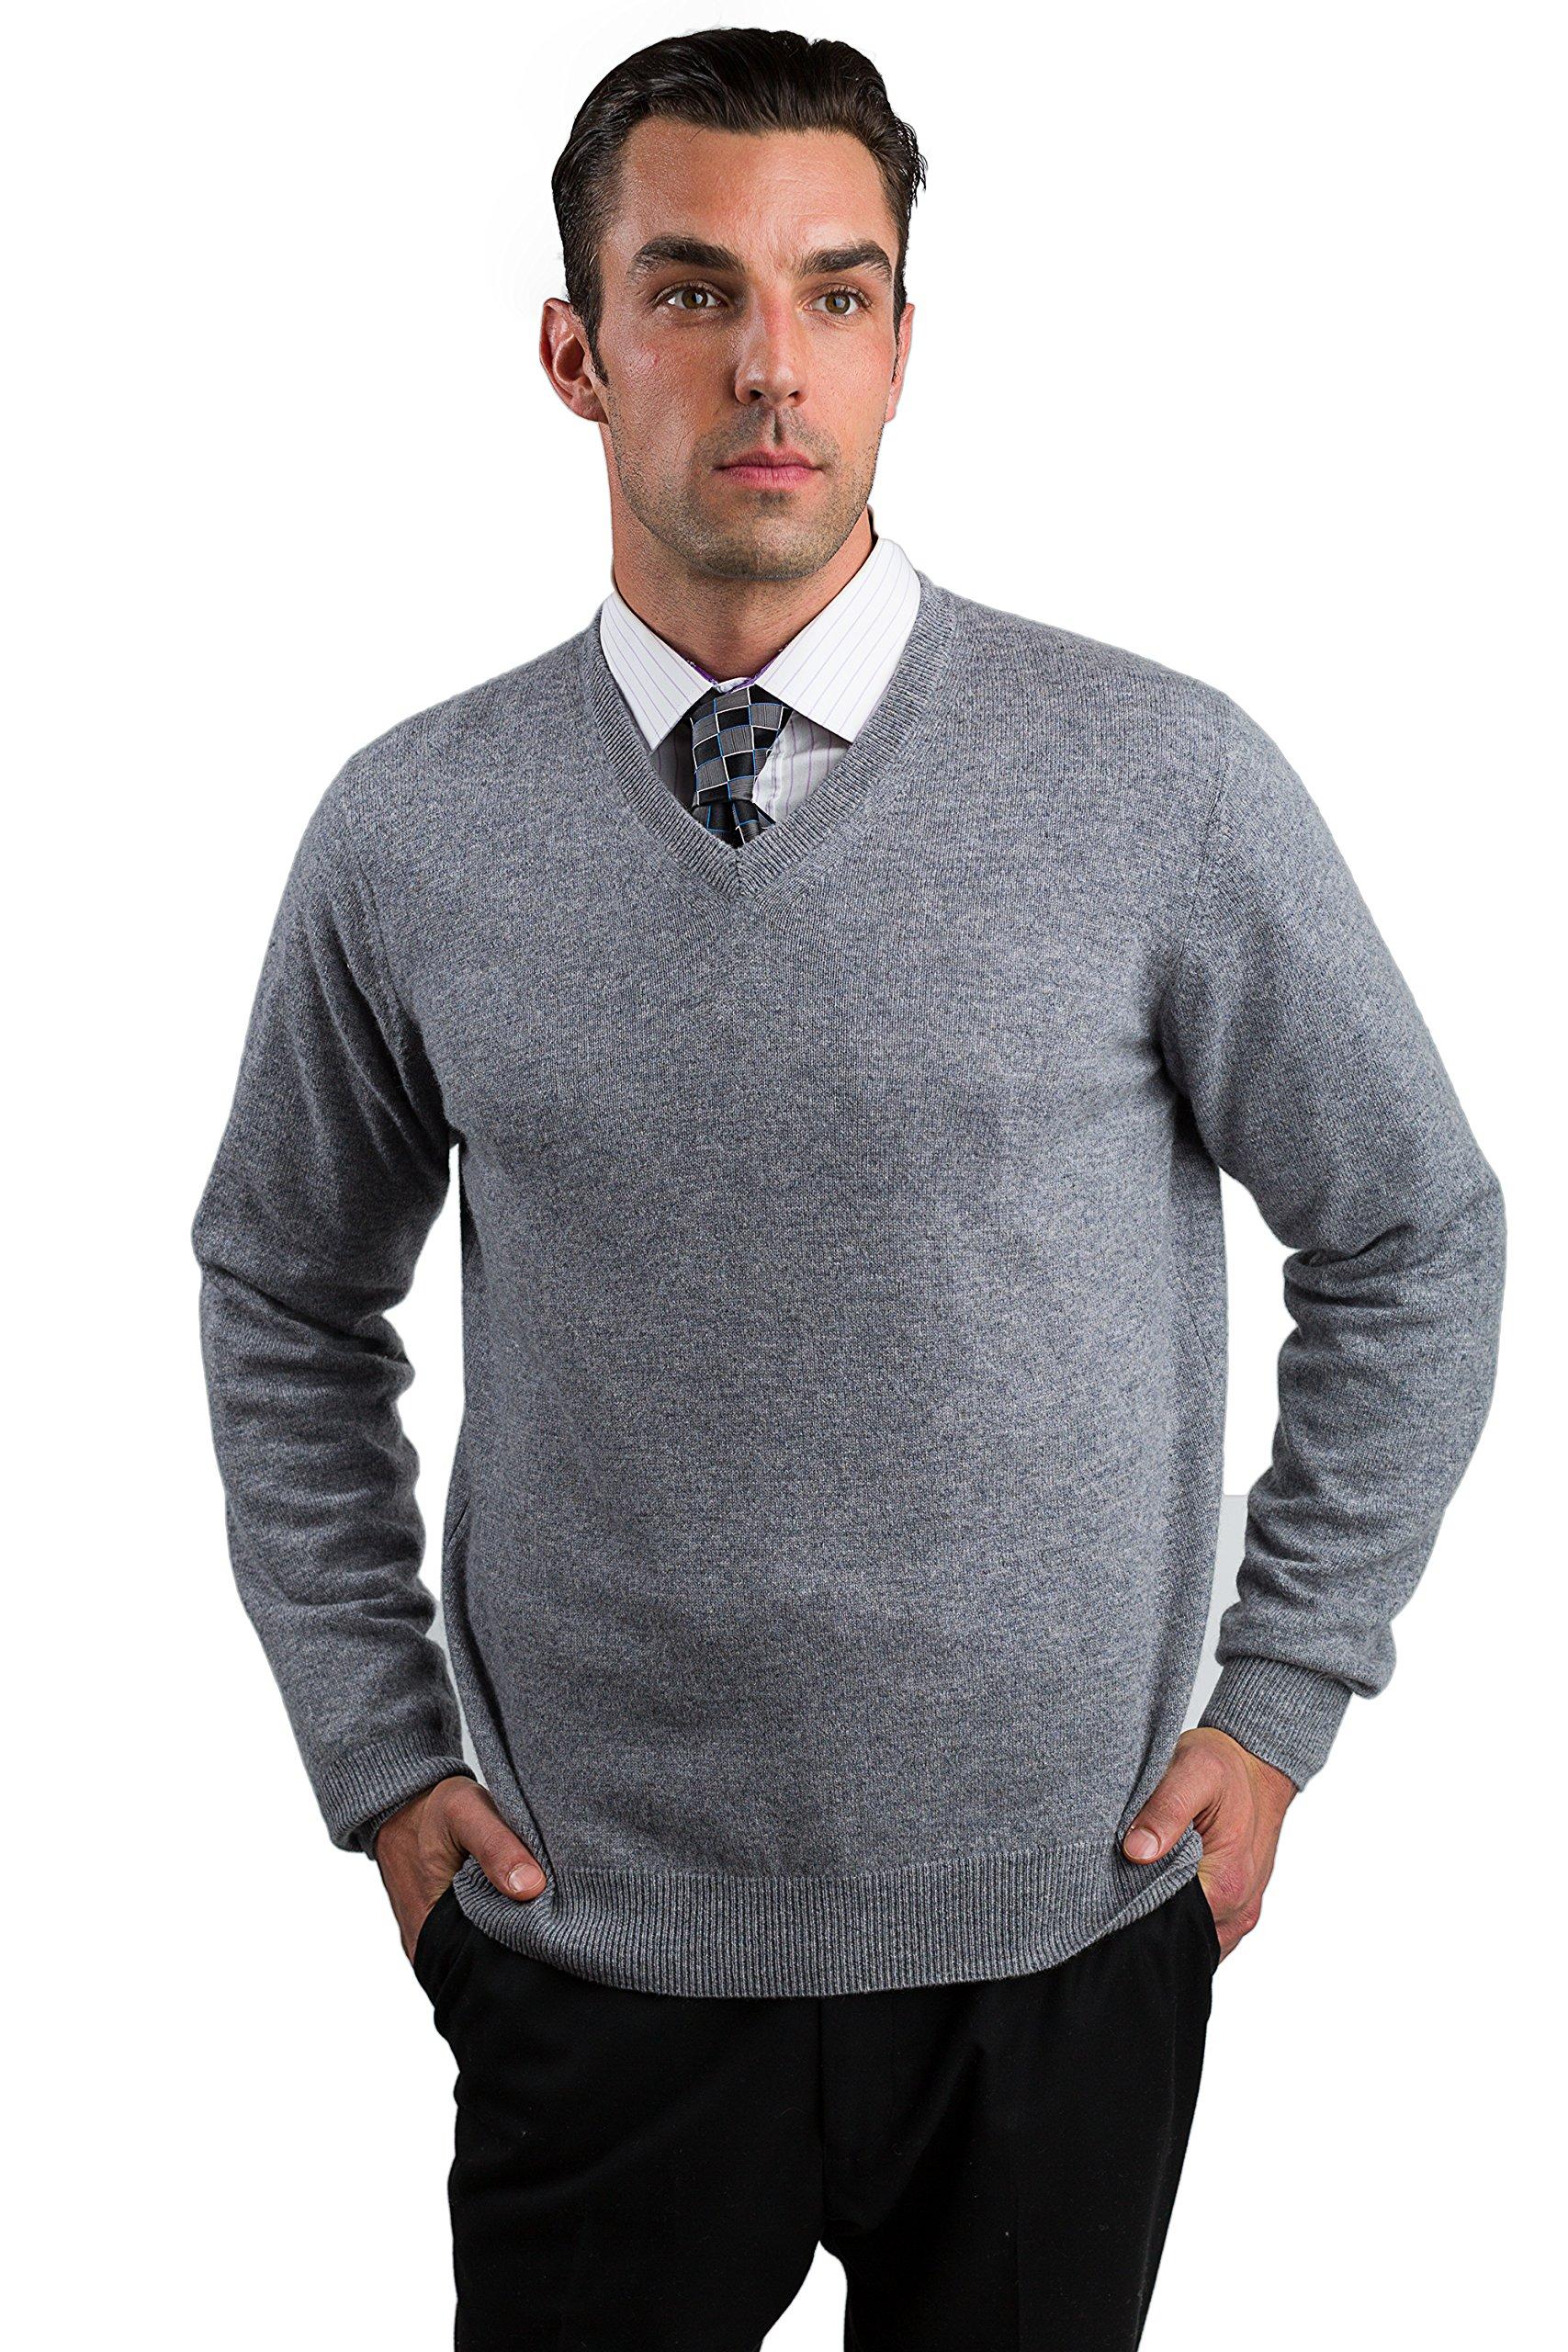 JENNIE LIU Men's 100% Pure Cashmere Long Sleeve Pullover V Neck Sweater (L, Grey) by JENNIE LIU